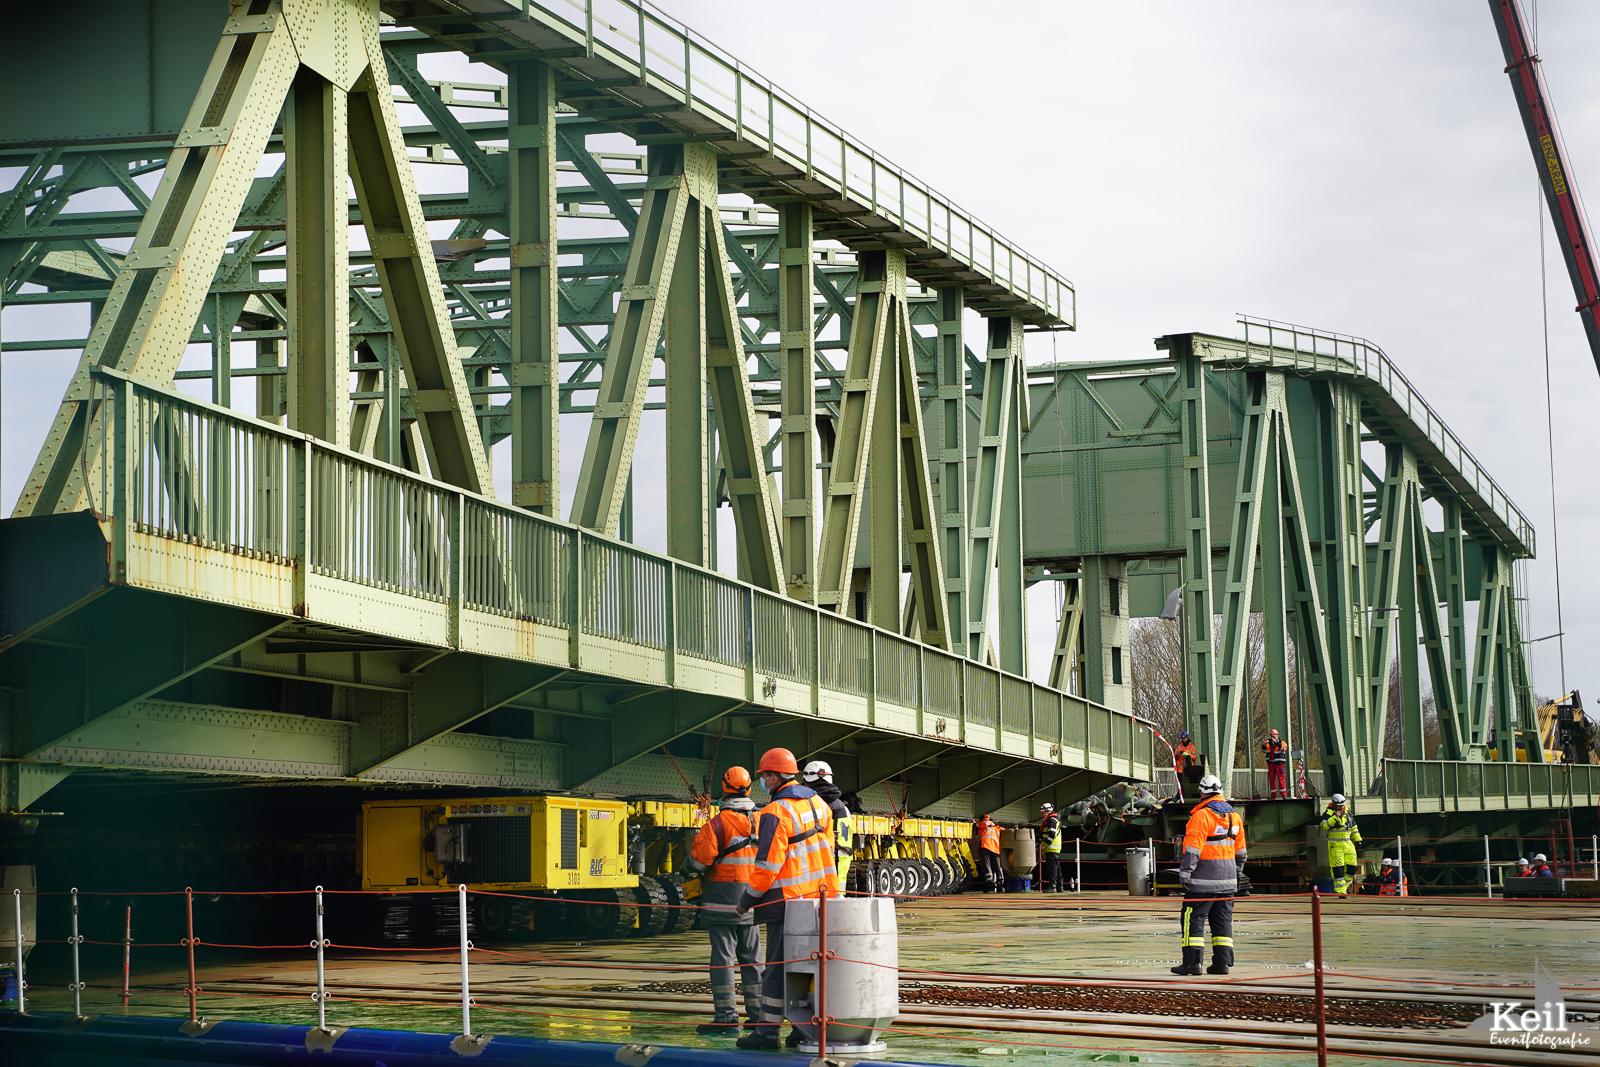 Abriss Europas größter drehbarer Eisenbahnbrücke in Bremerhaven